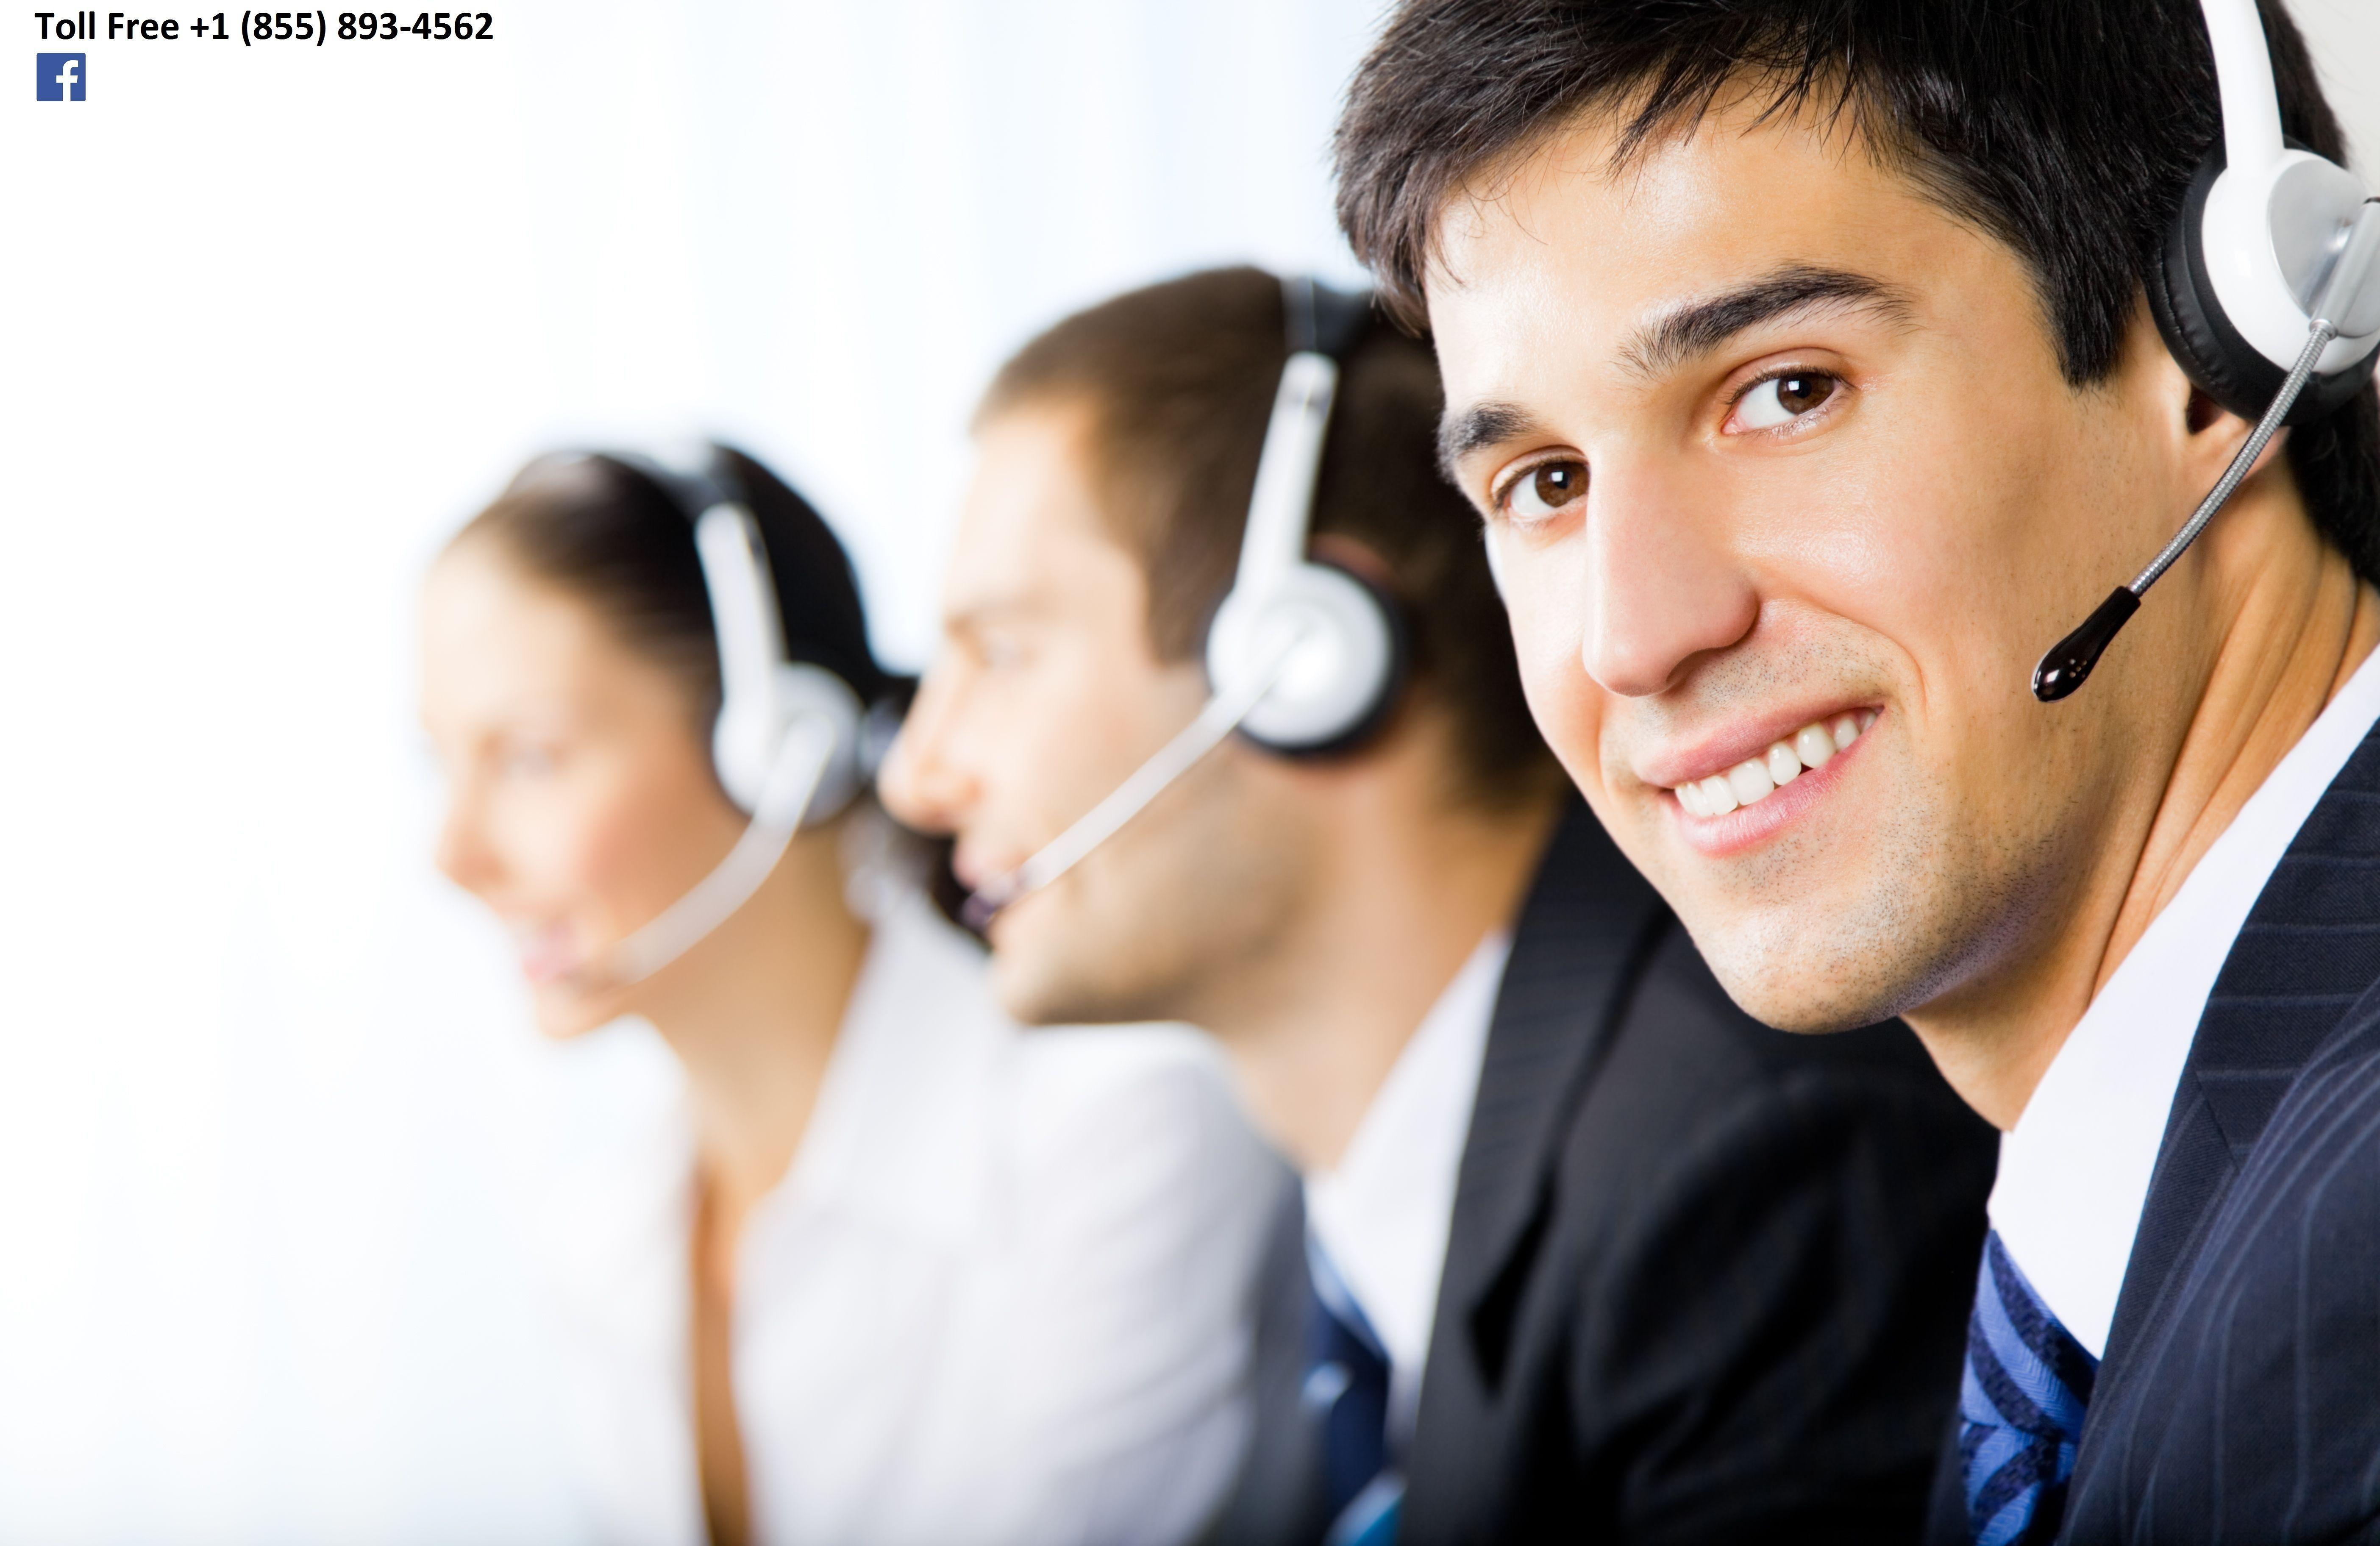 Facebook Help +1-855-893-4562 Facebook Help Center Toll Free Number